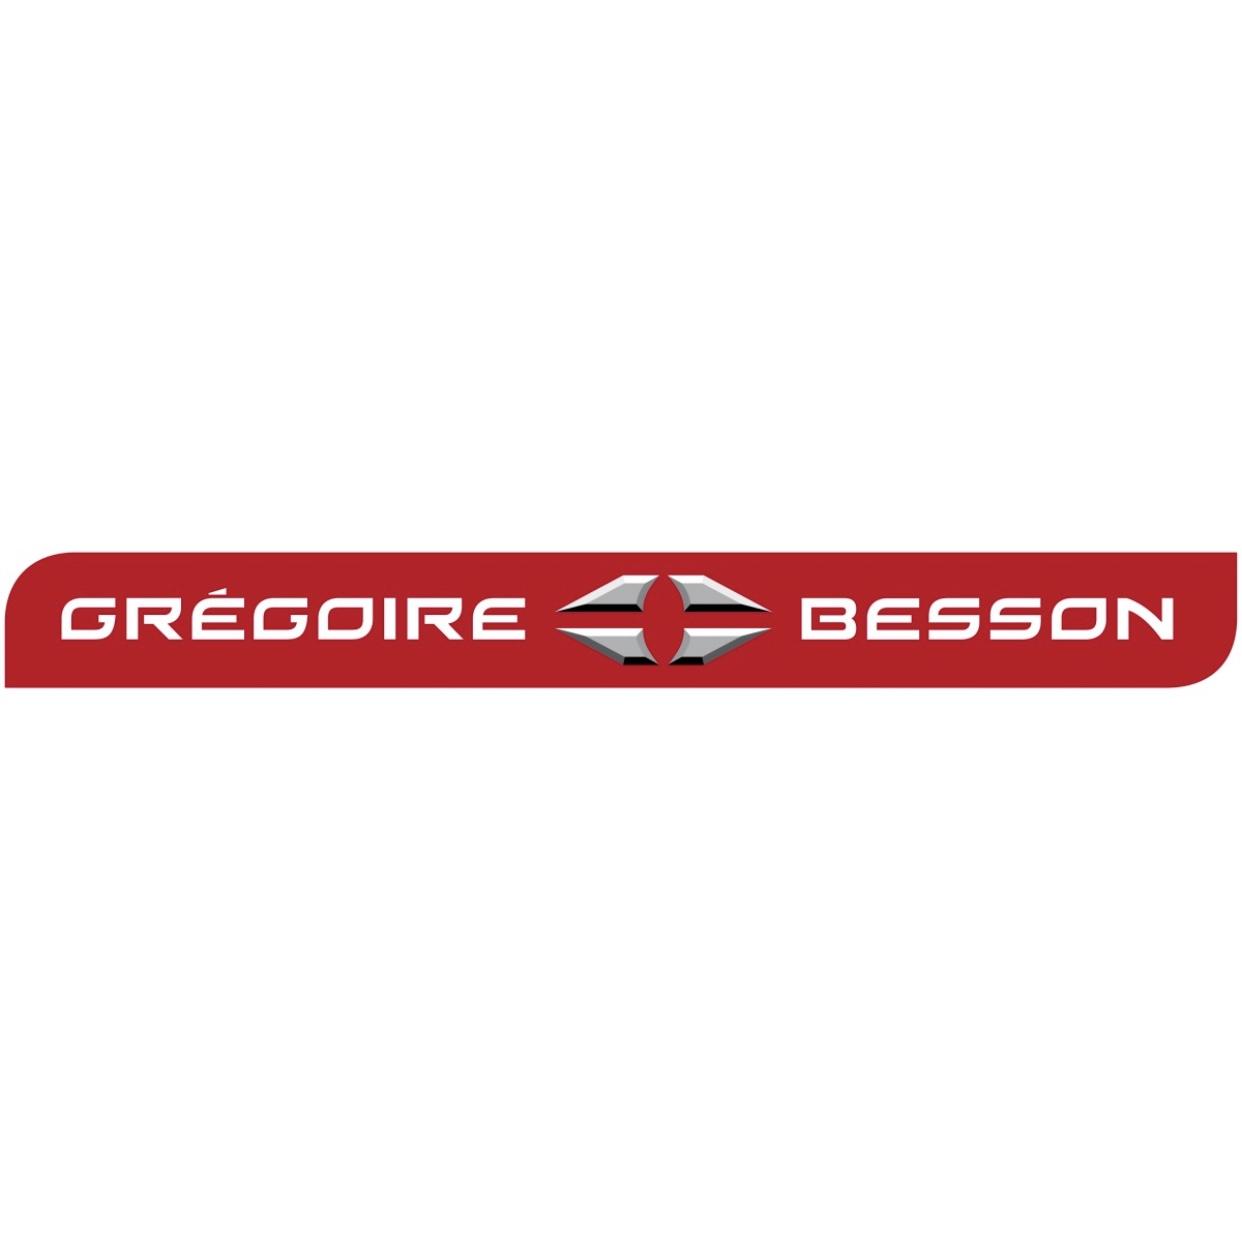 Gregoire Besson 1231314